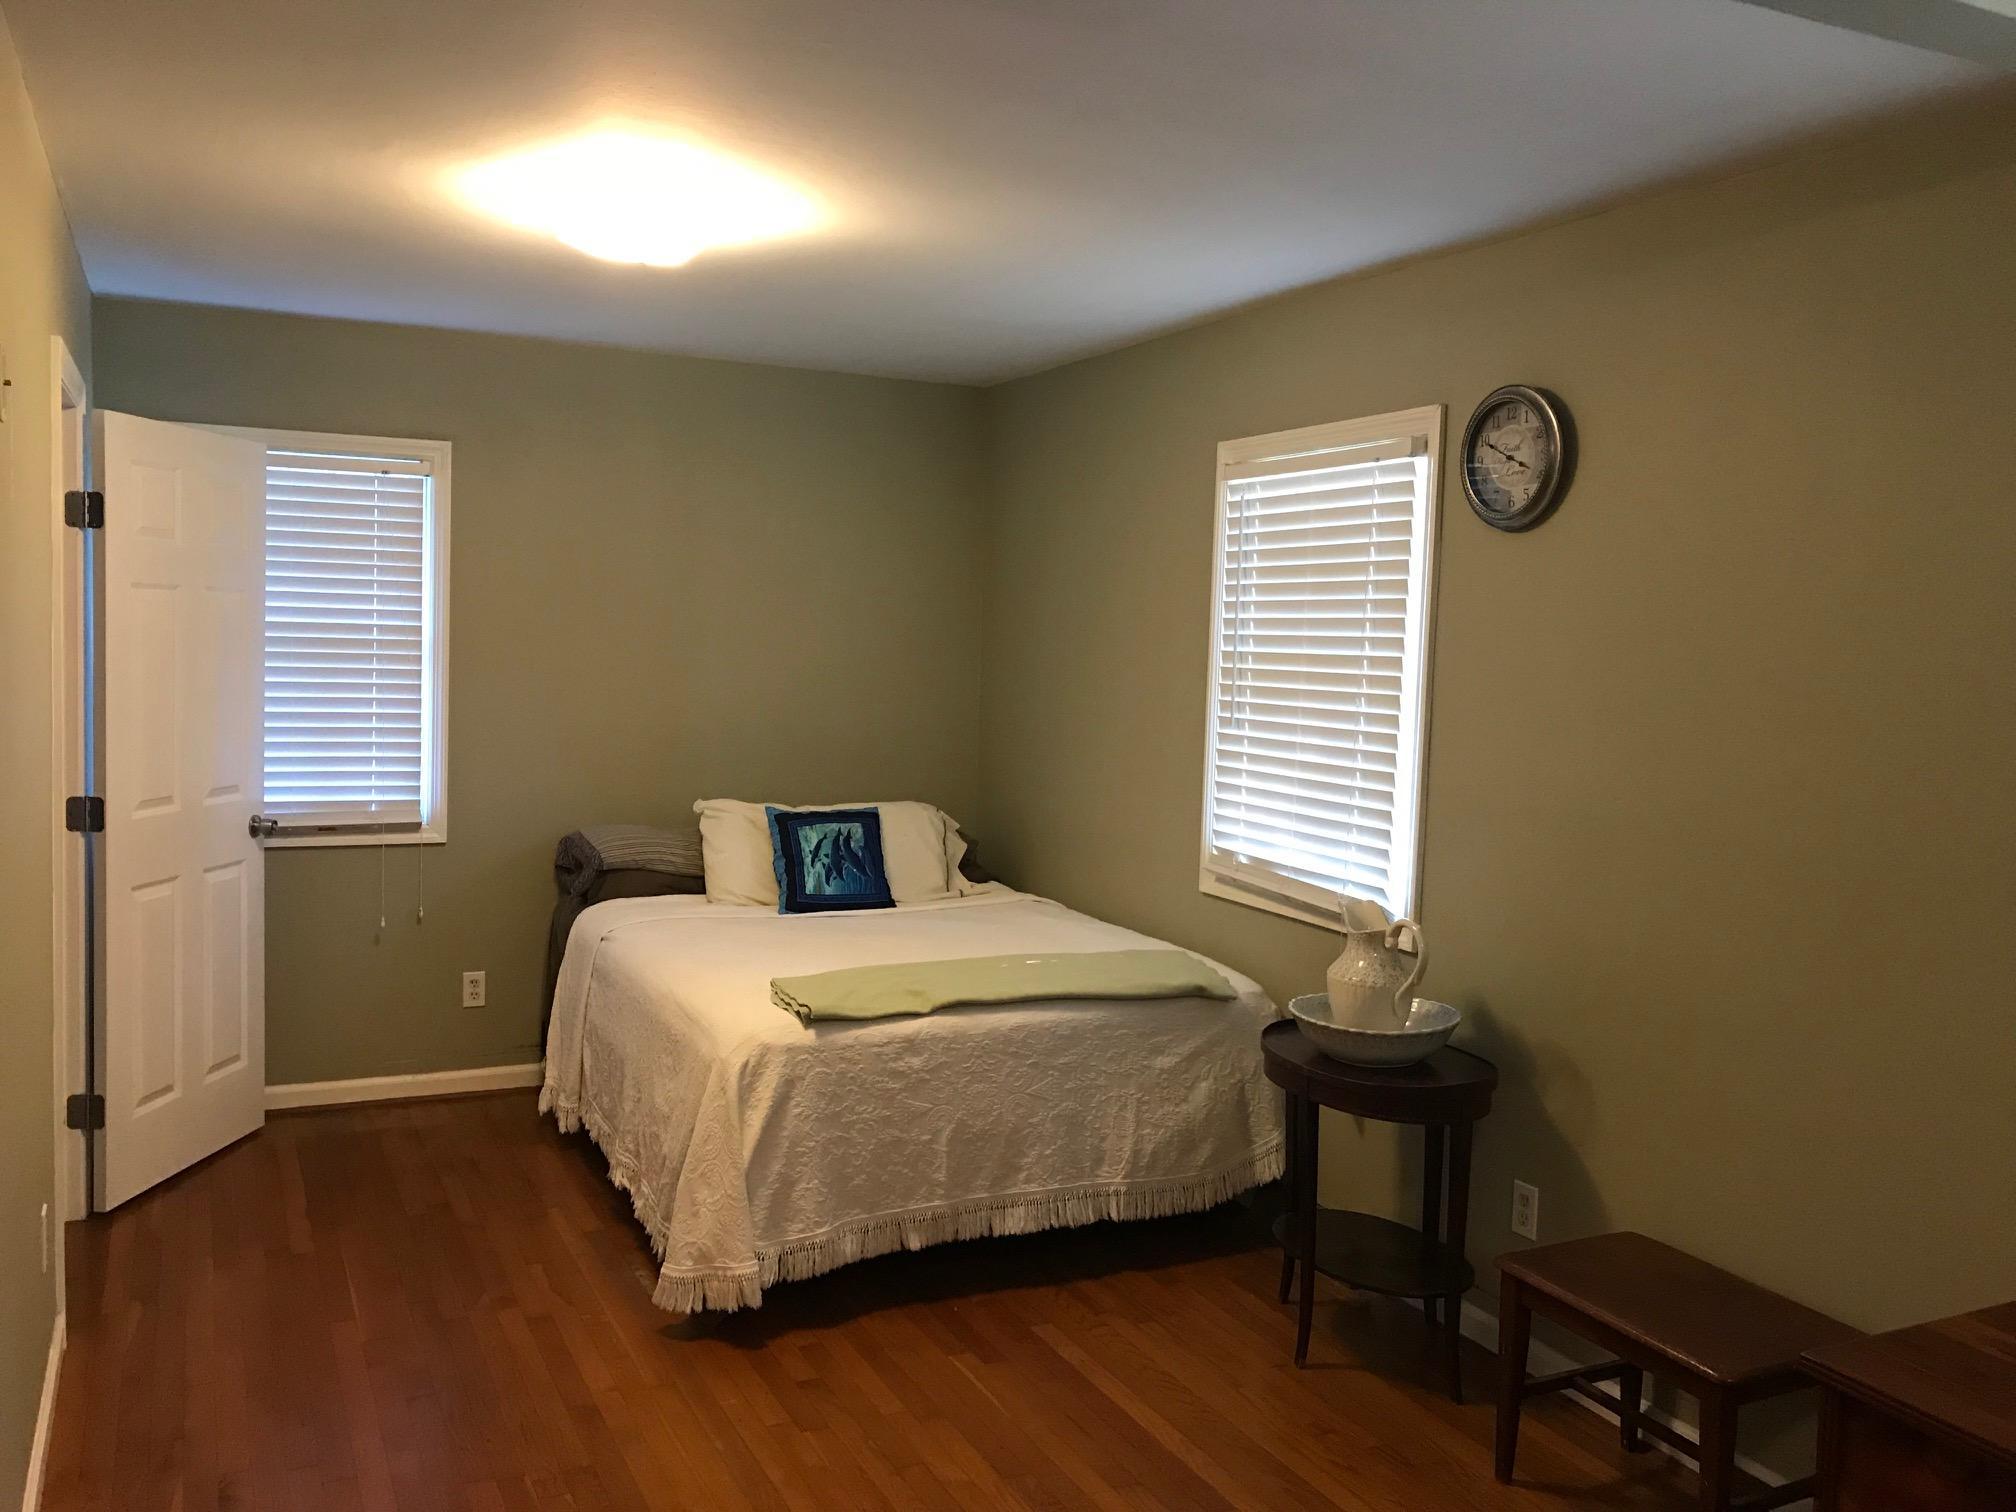 Northbridge Terrace Homes For Sale - 1079 Orange Grove, Charleston, SC - 31